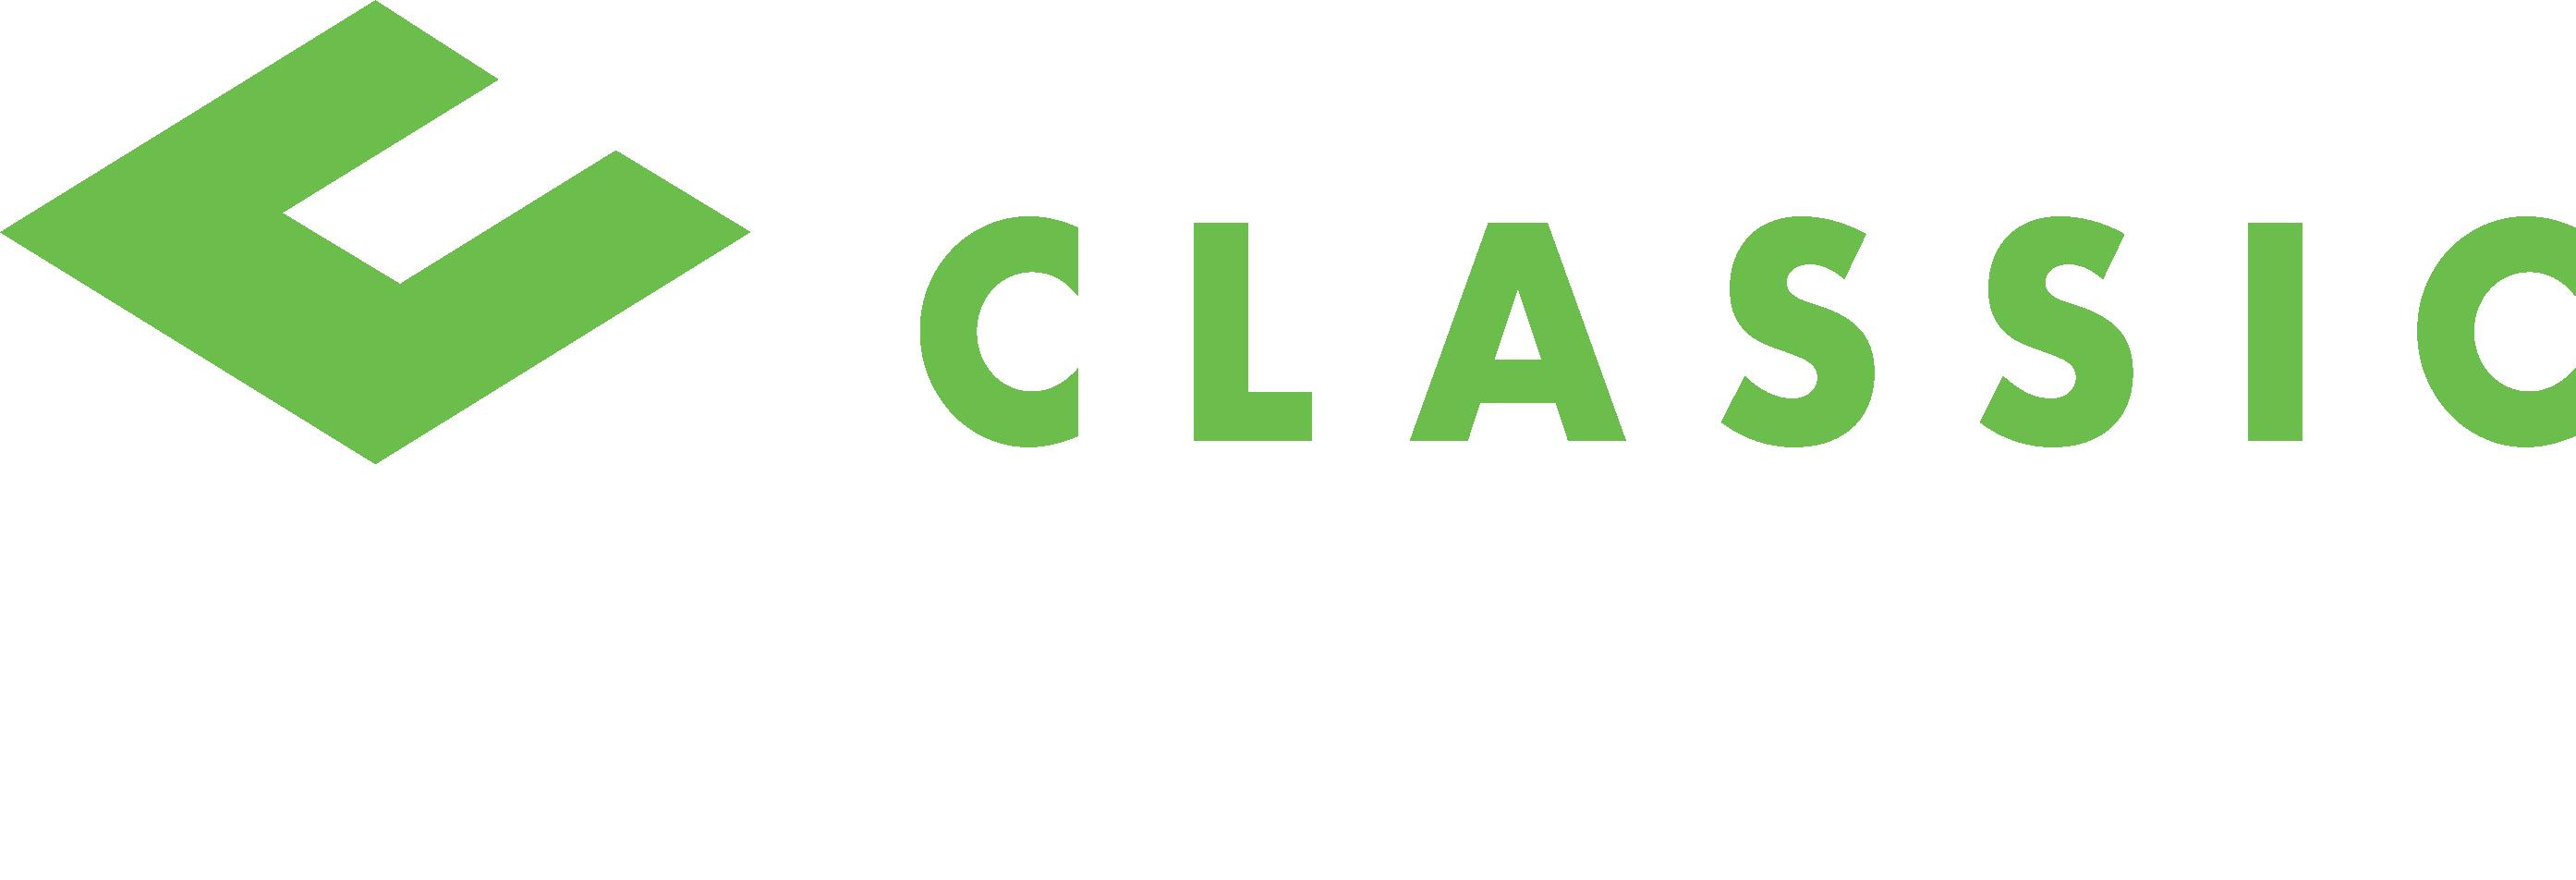 cm-logo-wt